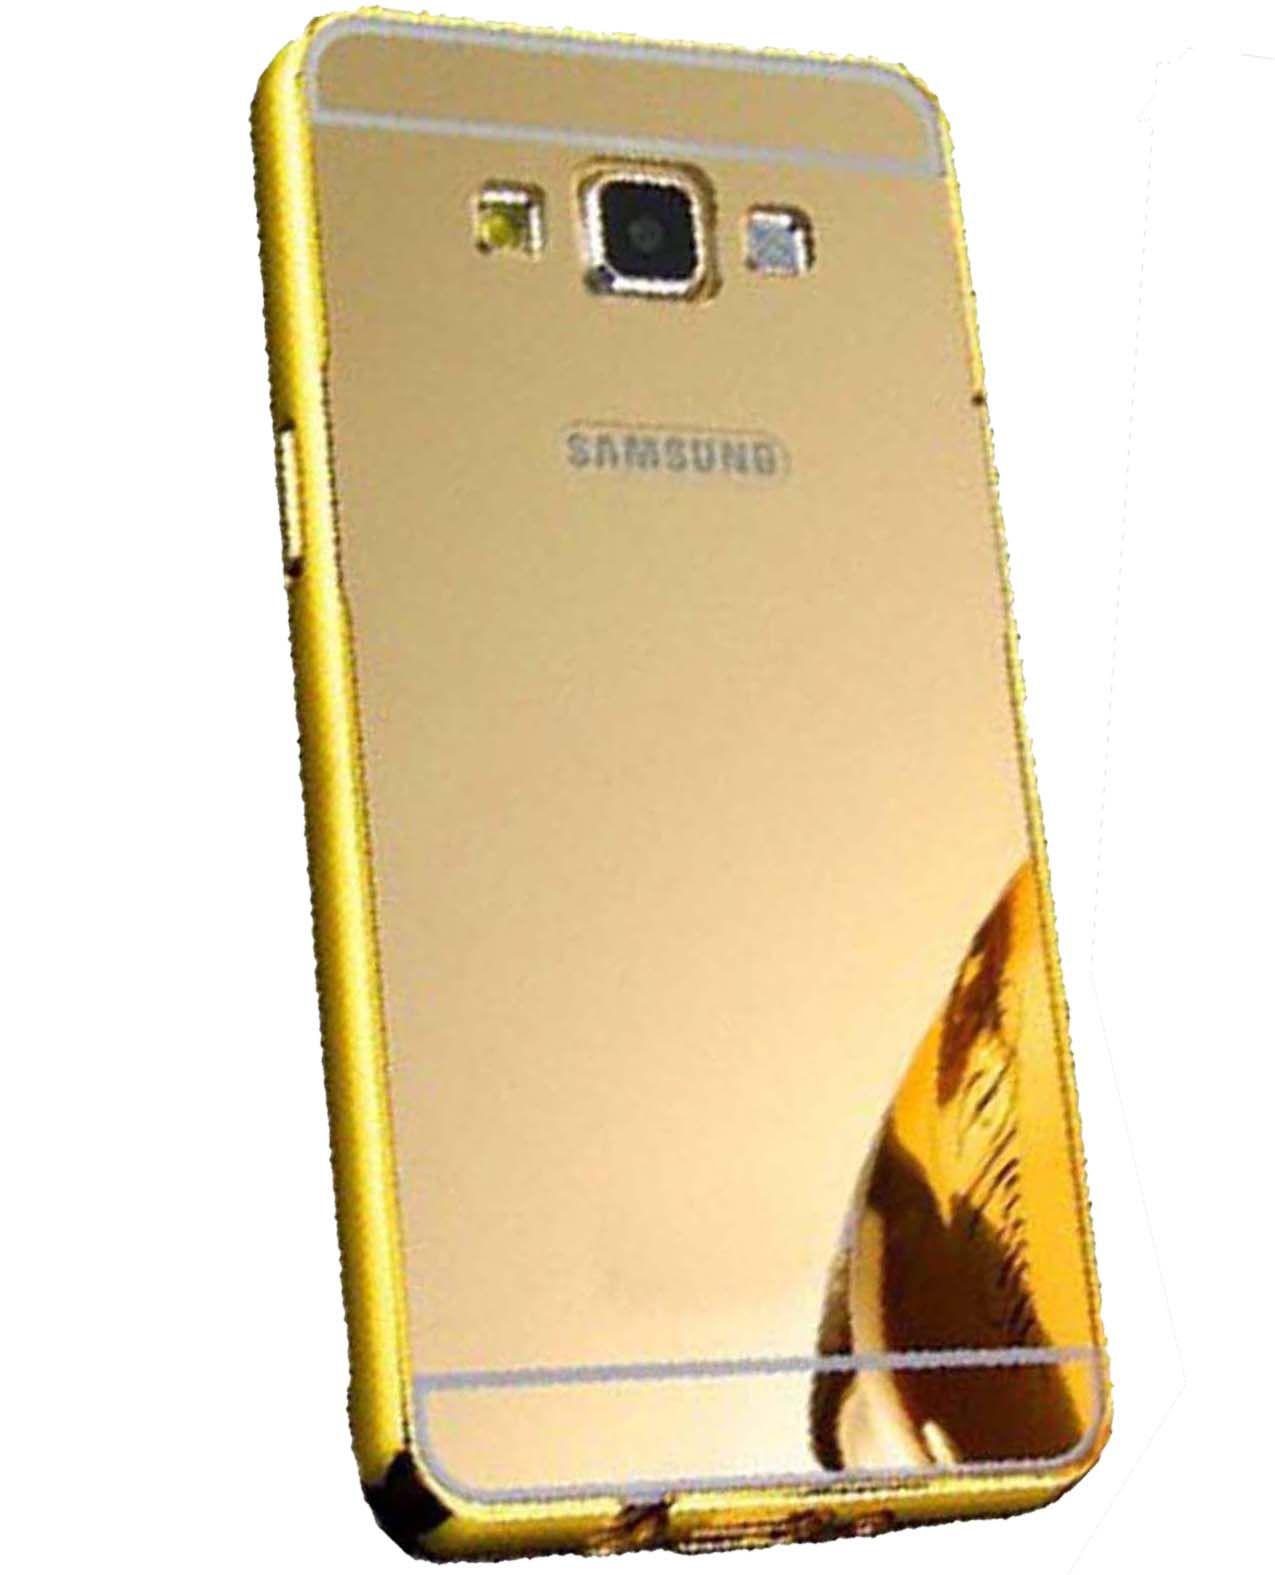 Samsung Galaxy J3 2016 Cover by Sedoka Golden